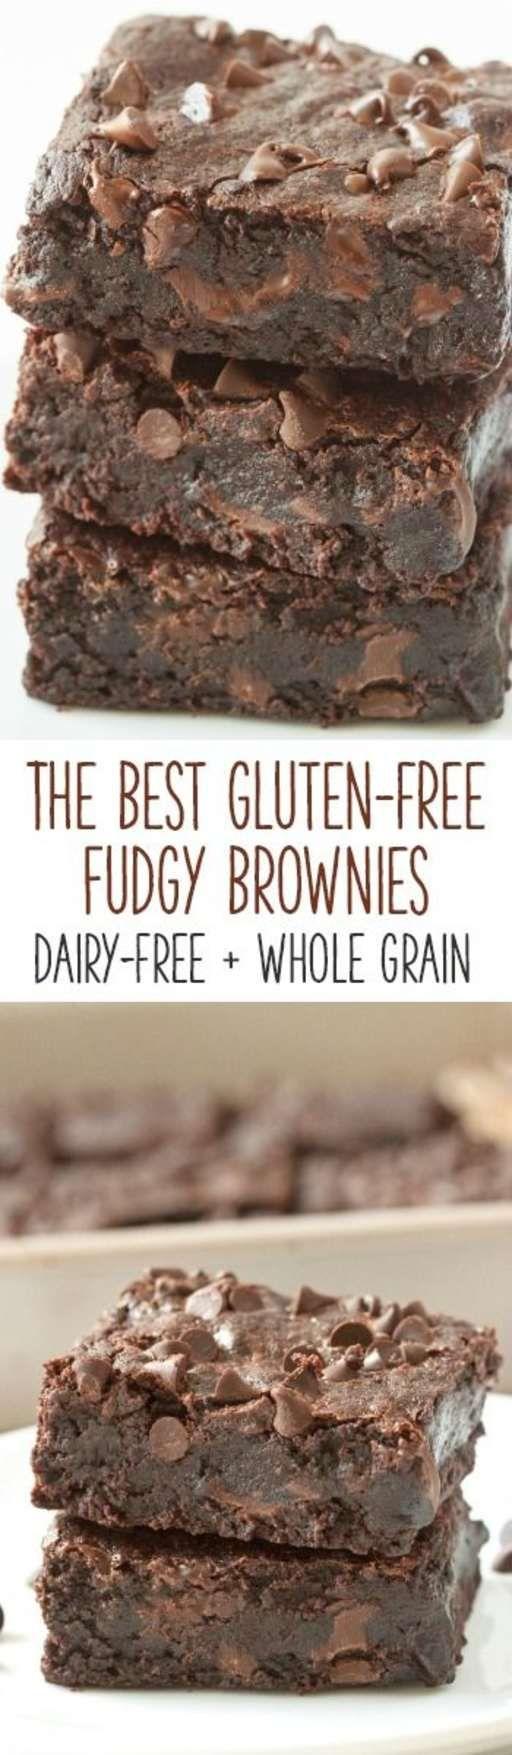 The Best Gluten-free Fudgy Brownies (dairy-free, whole grain)